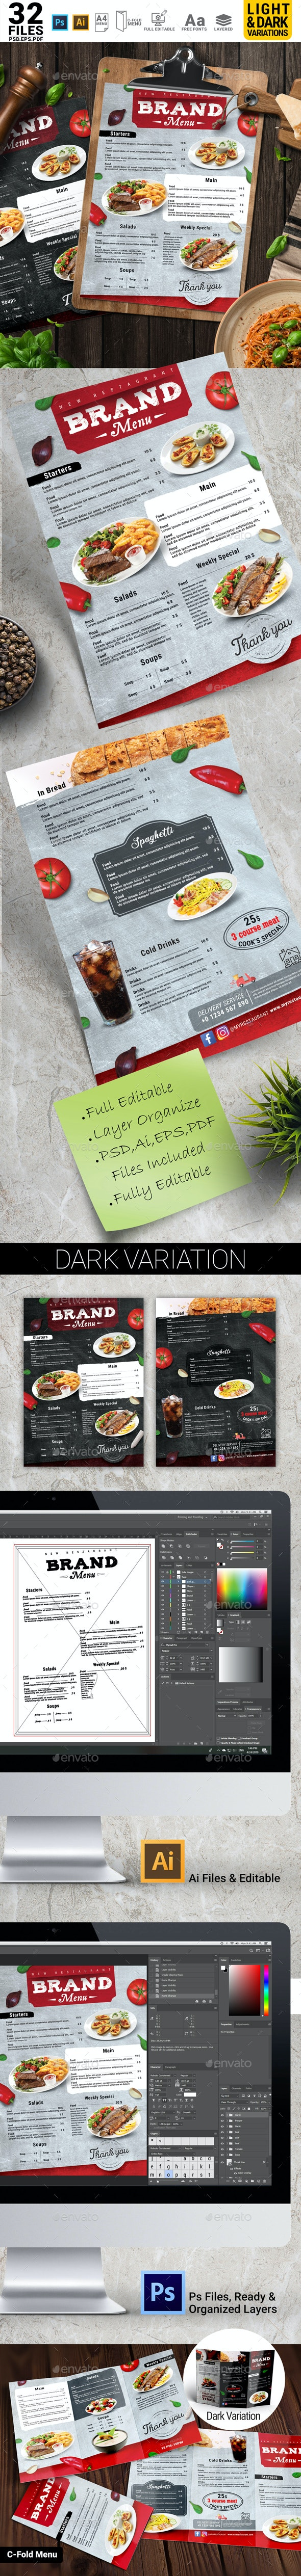 New Restaurant Menu Design Template+ C Fold Menu - Food Menus Print Templates